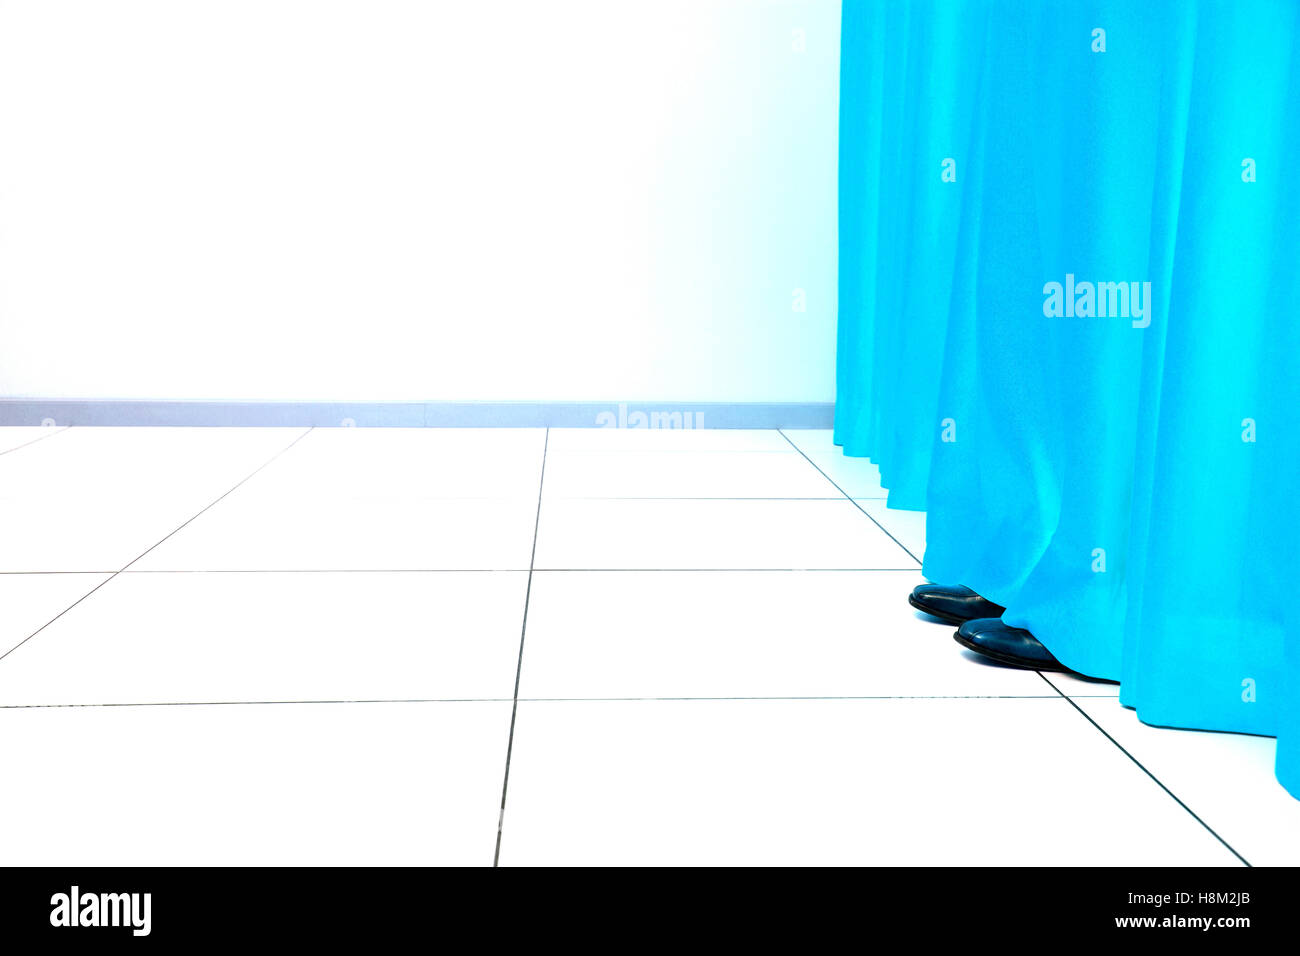 Feet Behind Curtain - Stock Image